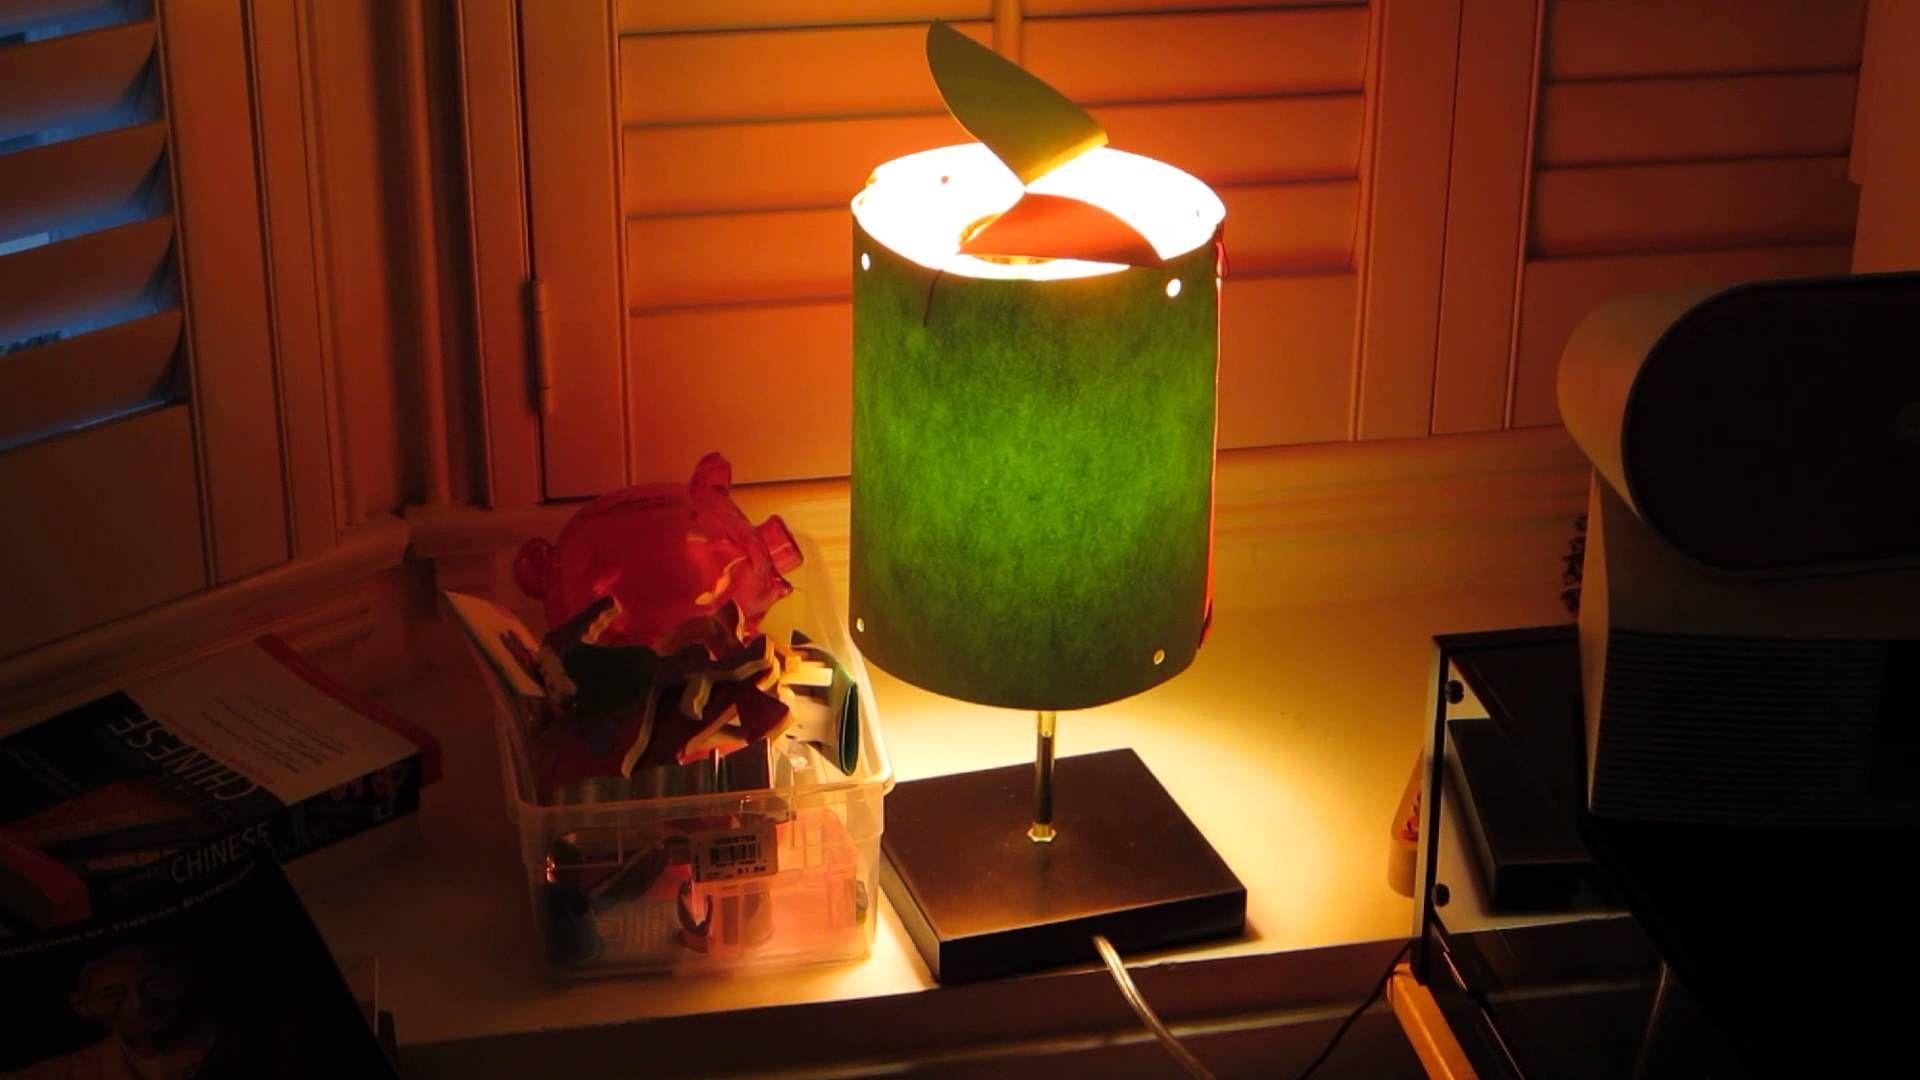 Homemade Spinning Lamp Shade Inspired By Curious George Lamp Diy Lamp Shade Diy Lanterns